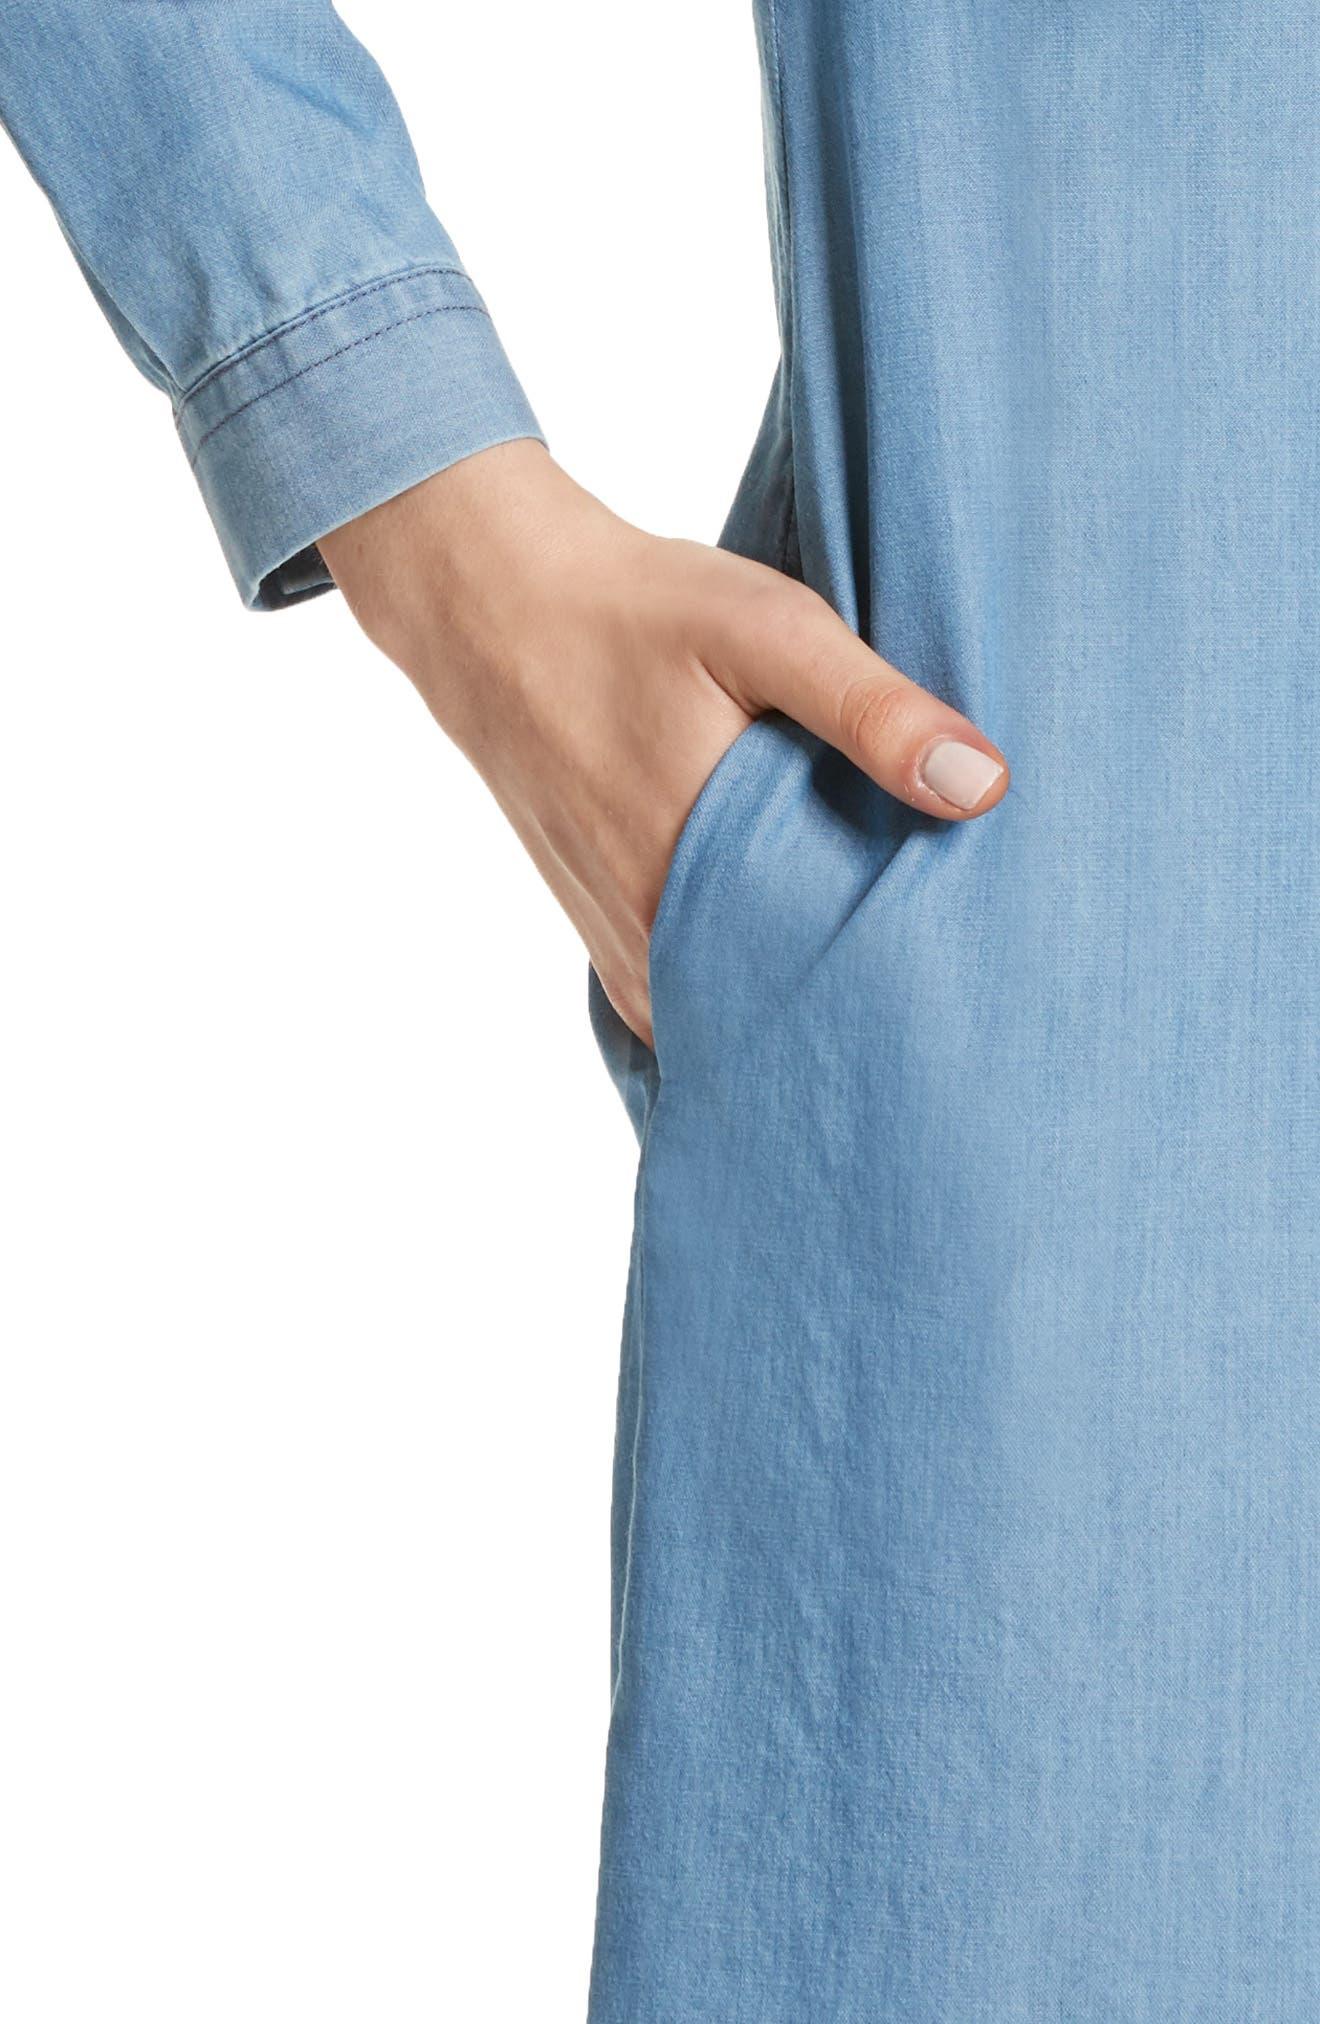 Cotton & Cashmere Chambray Shirtdress,                             Alternate thumbnail 4, color,                             Denim Blue